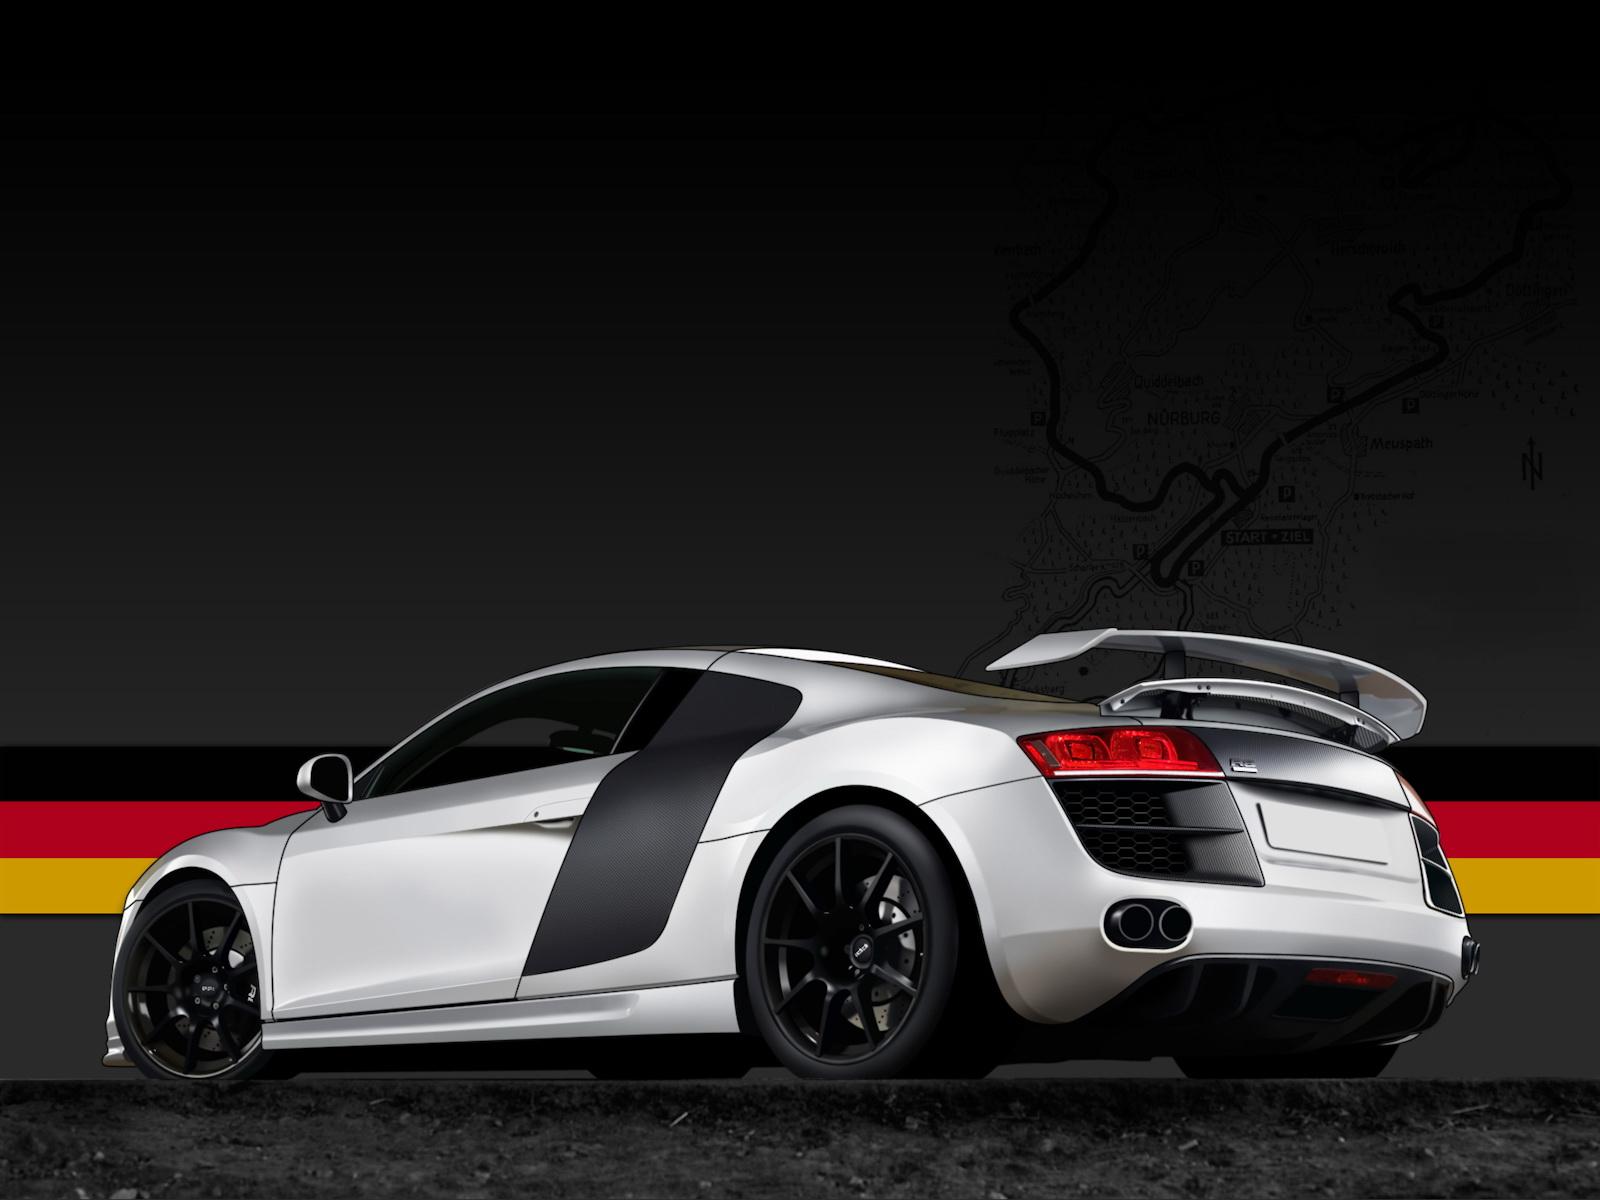 hd amazing cars s 3